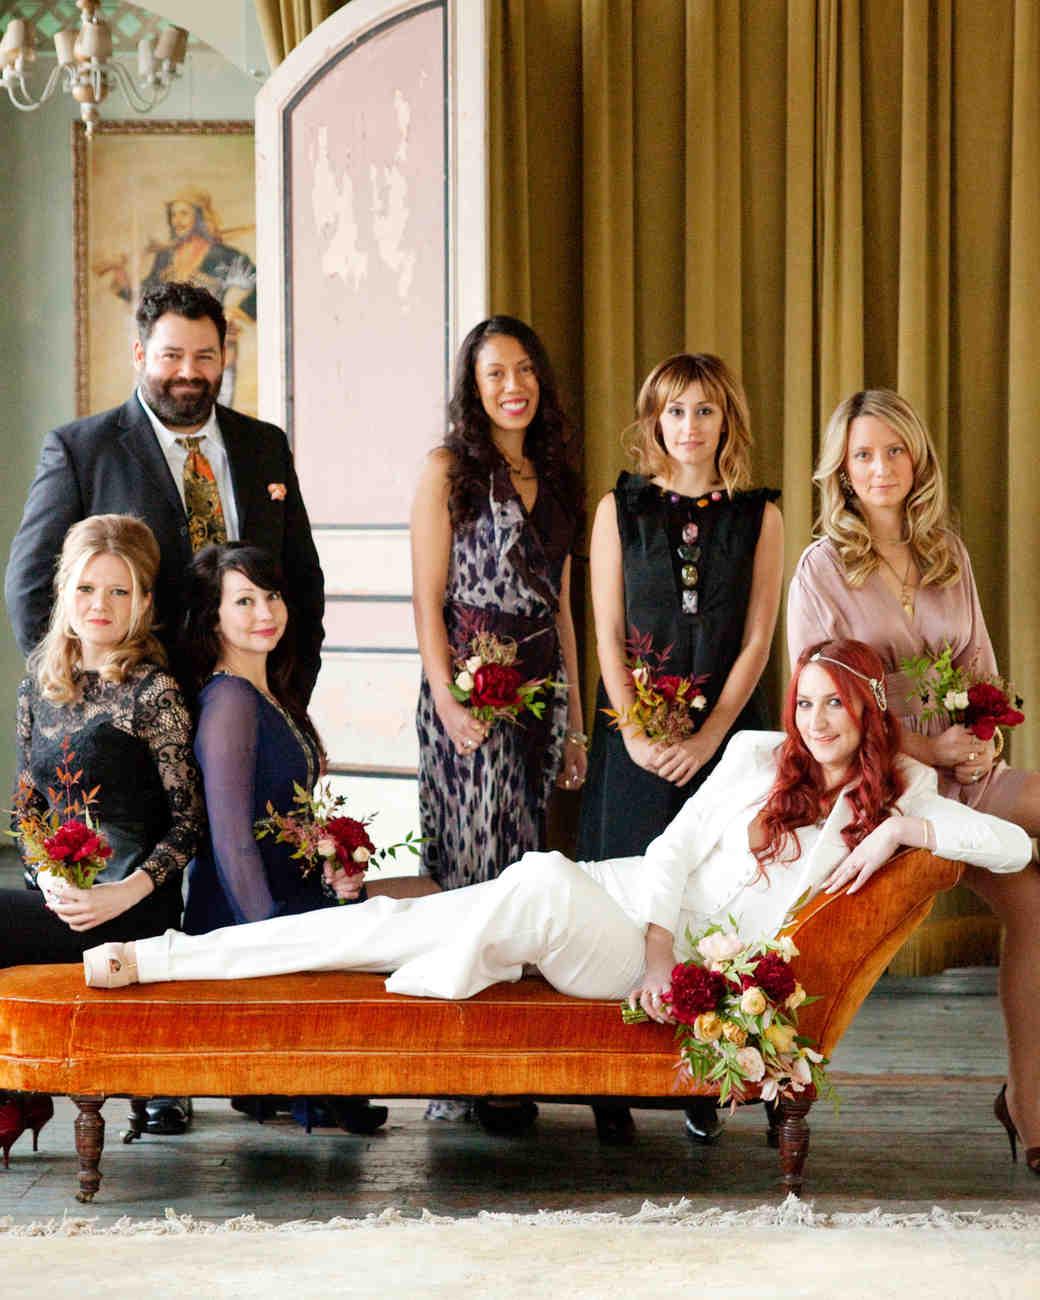 9 Nontraditional Wedding Party Ideas